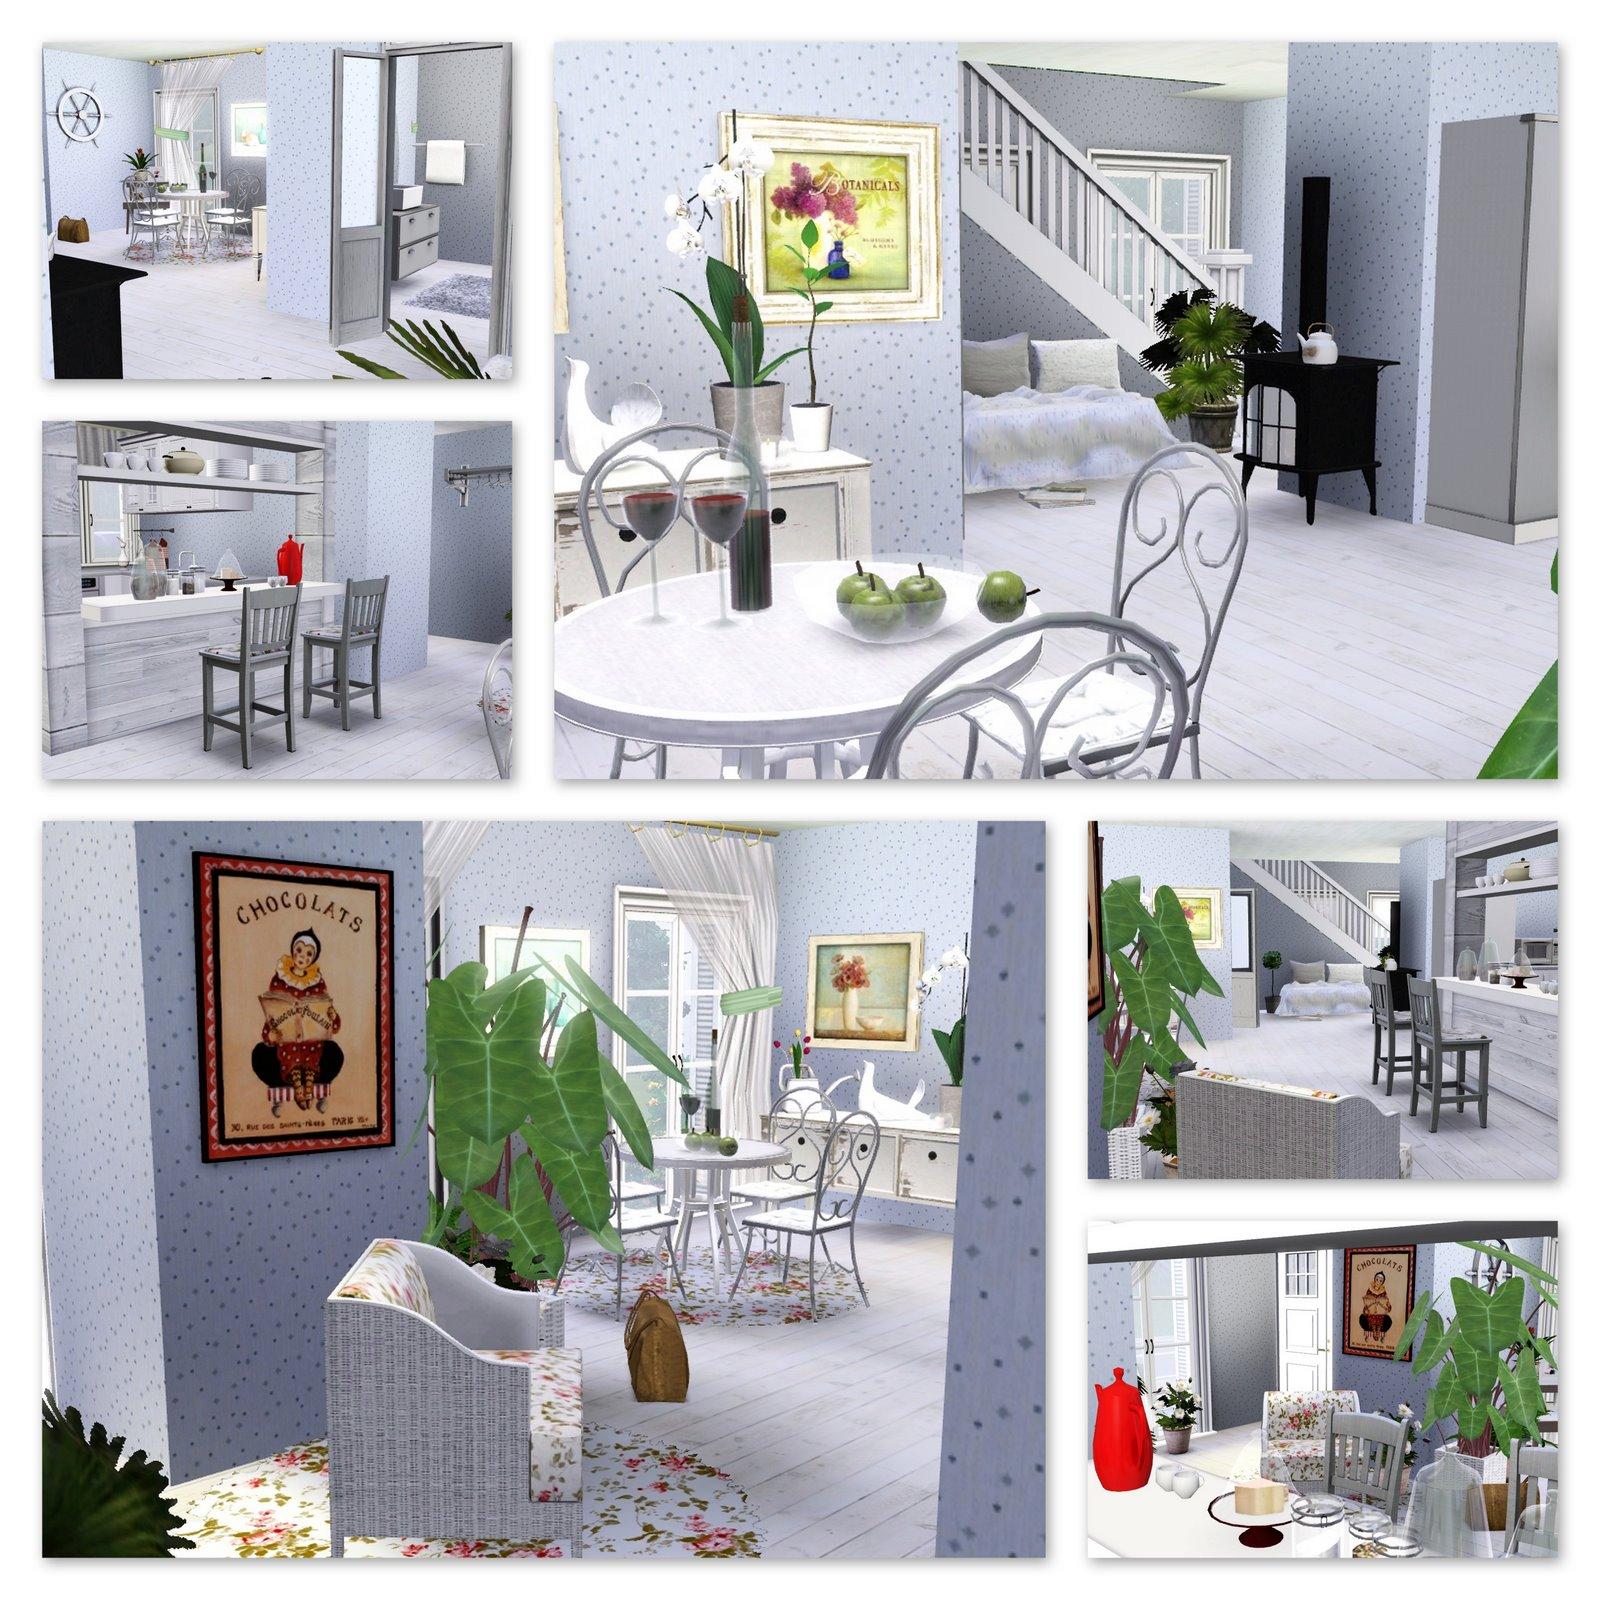 Romantika home decor products.